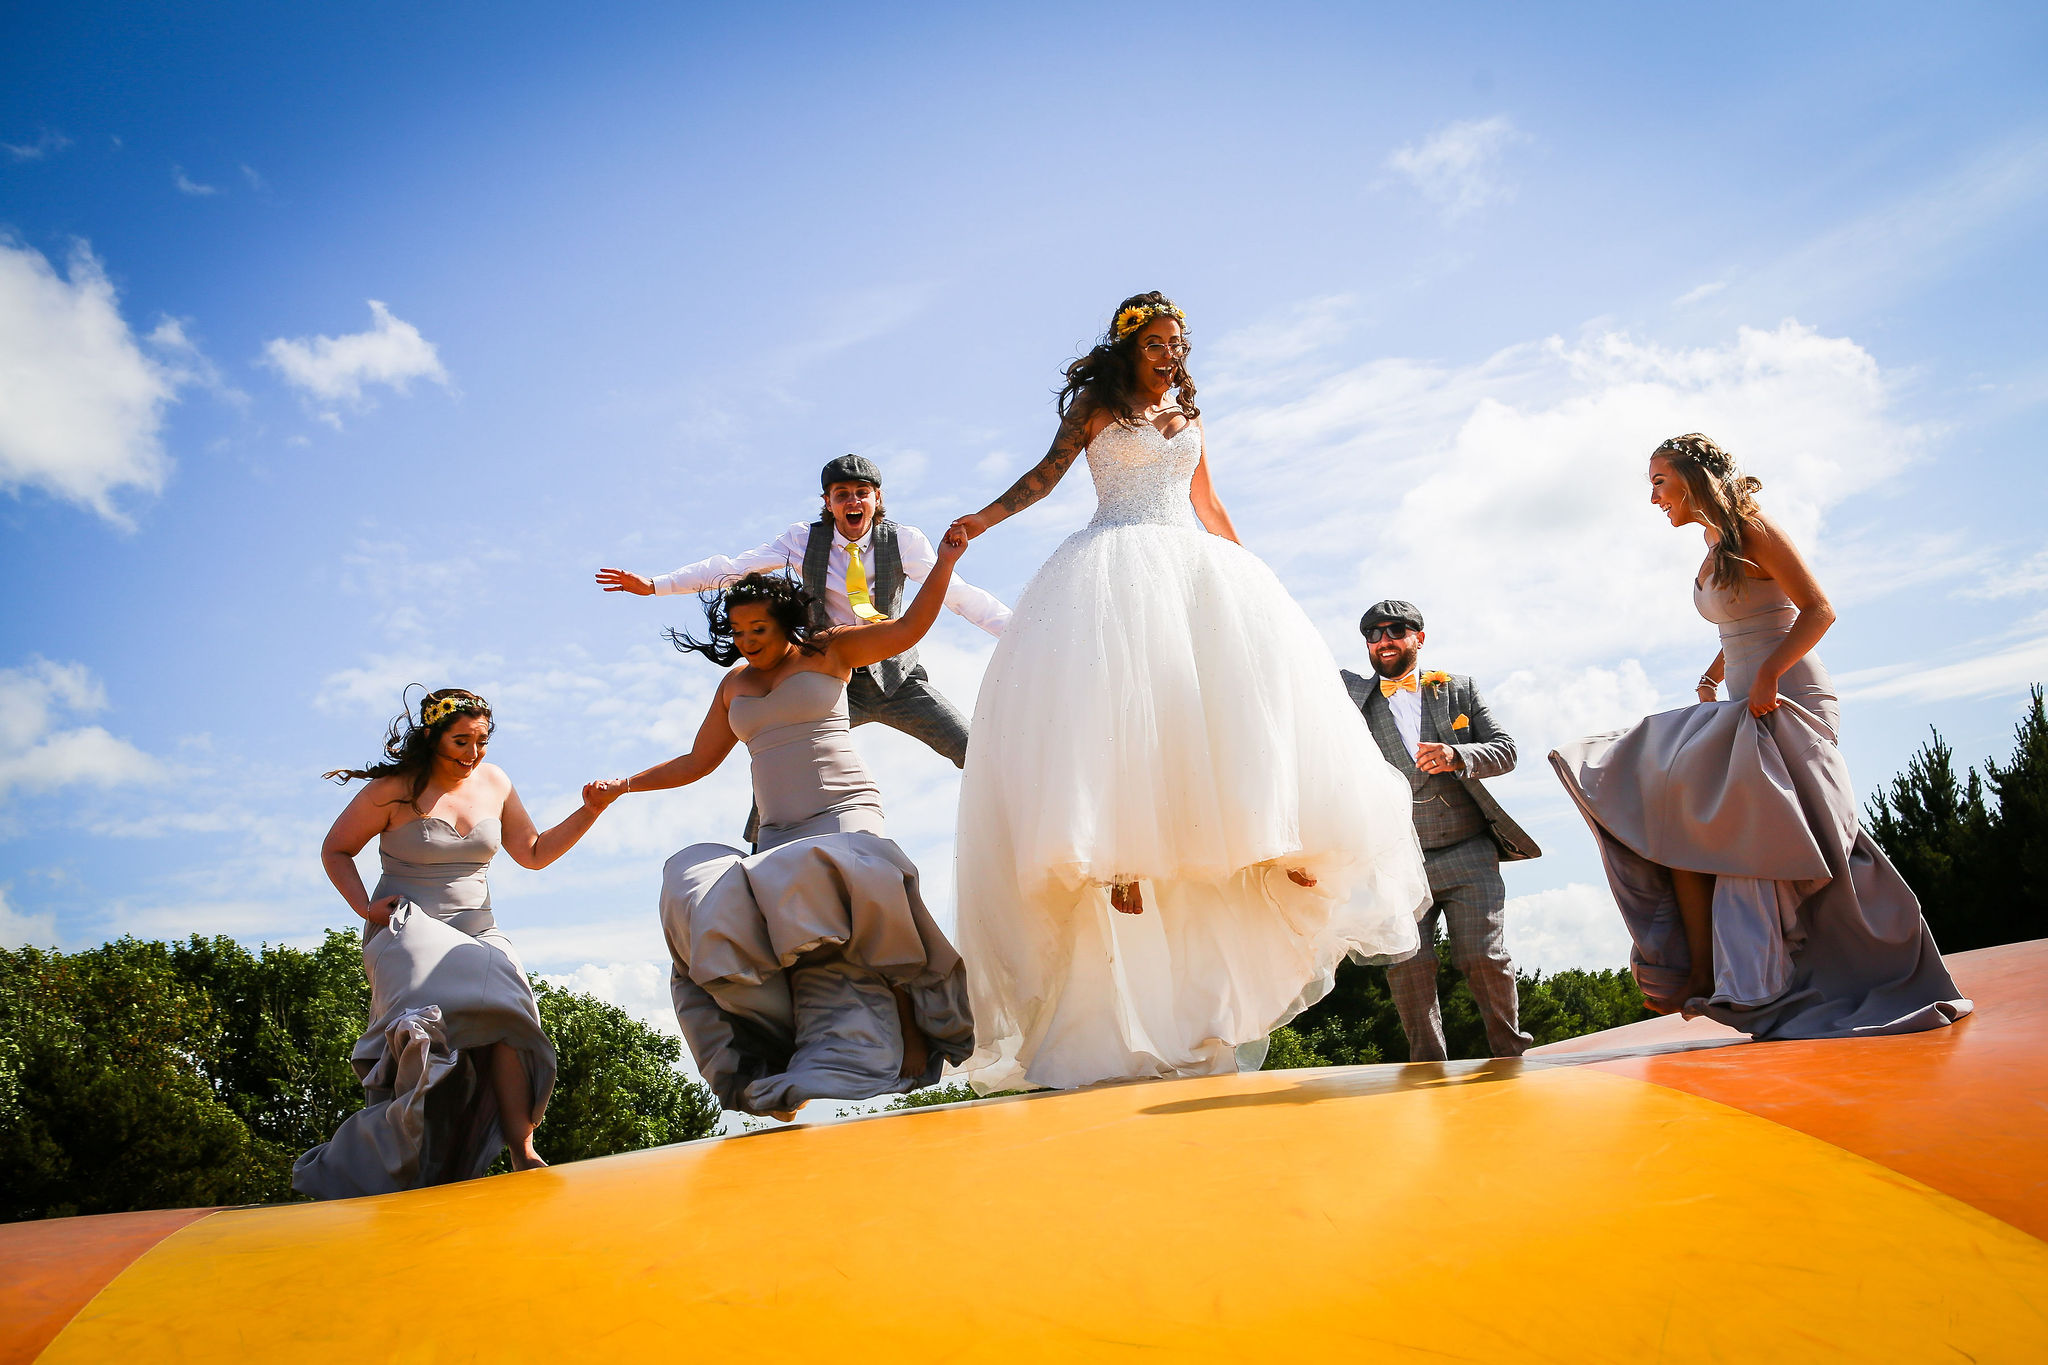 Freeformimages Photography- Devon Wedding Photography- Documentary Wedding Photography- Unconventional Wedding